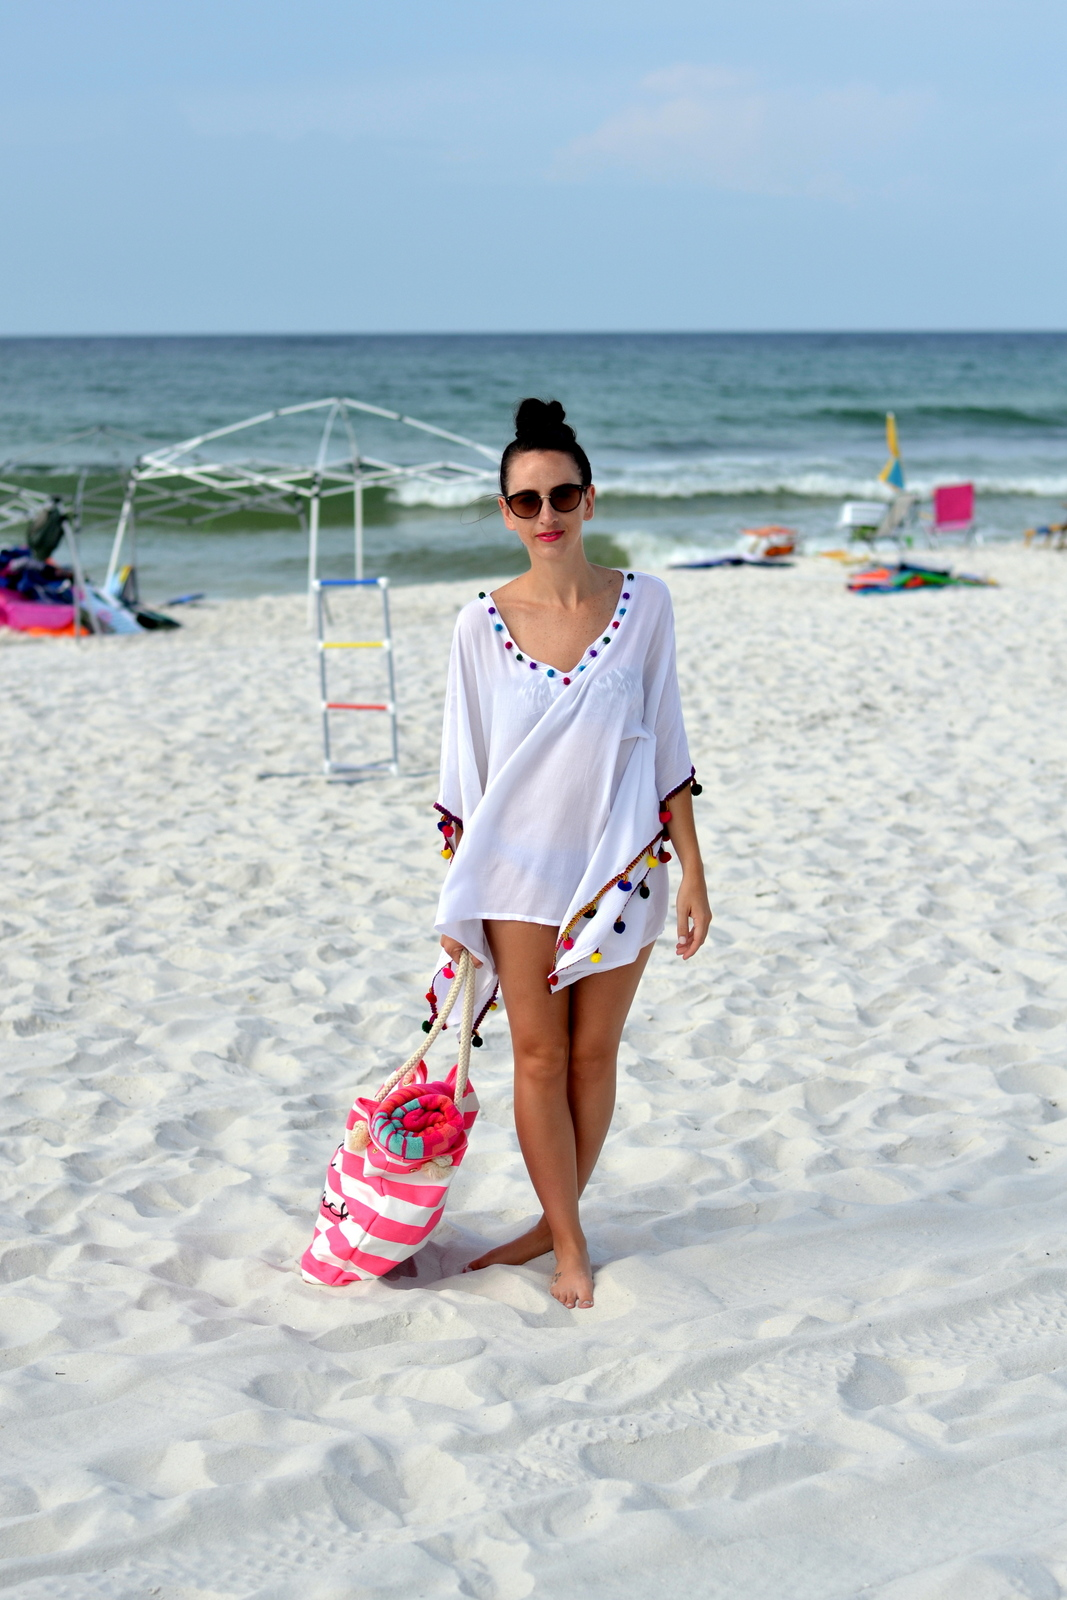 Beach coverup, sunnies and beach bag